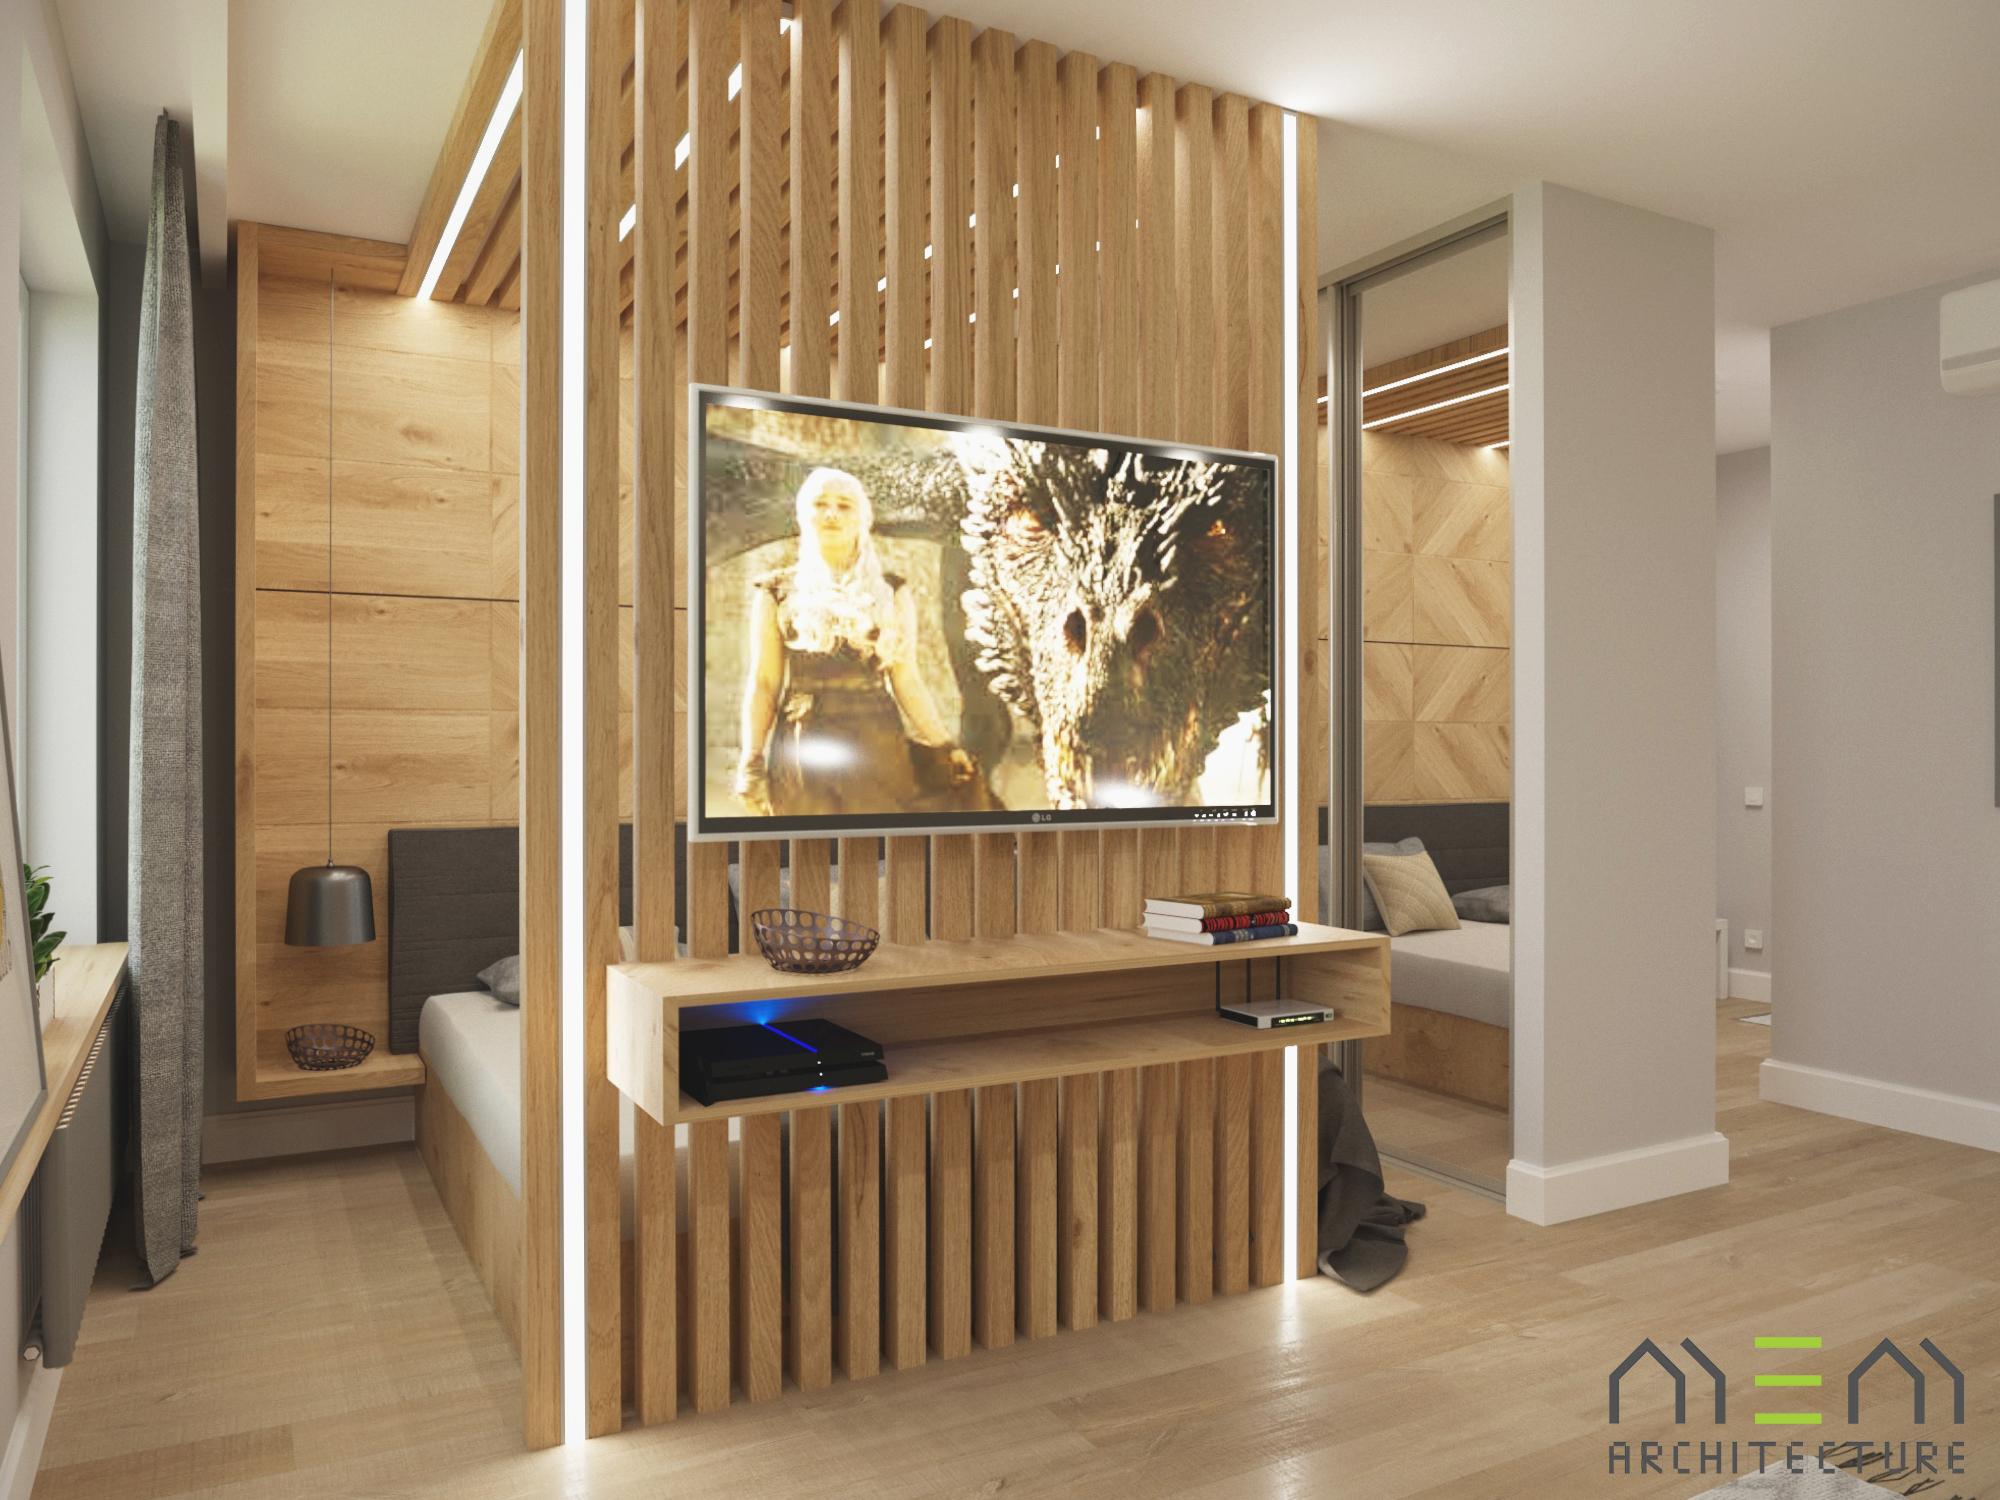 Дизайн-проект квартиры 41м2 в поселке Коммунарка